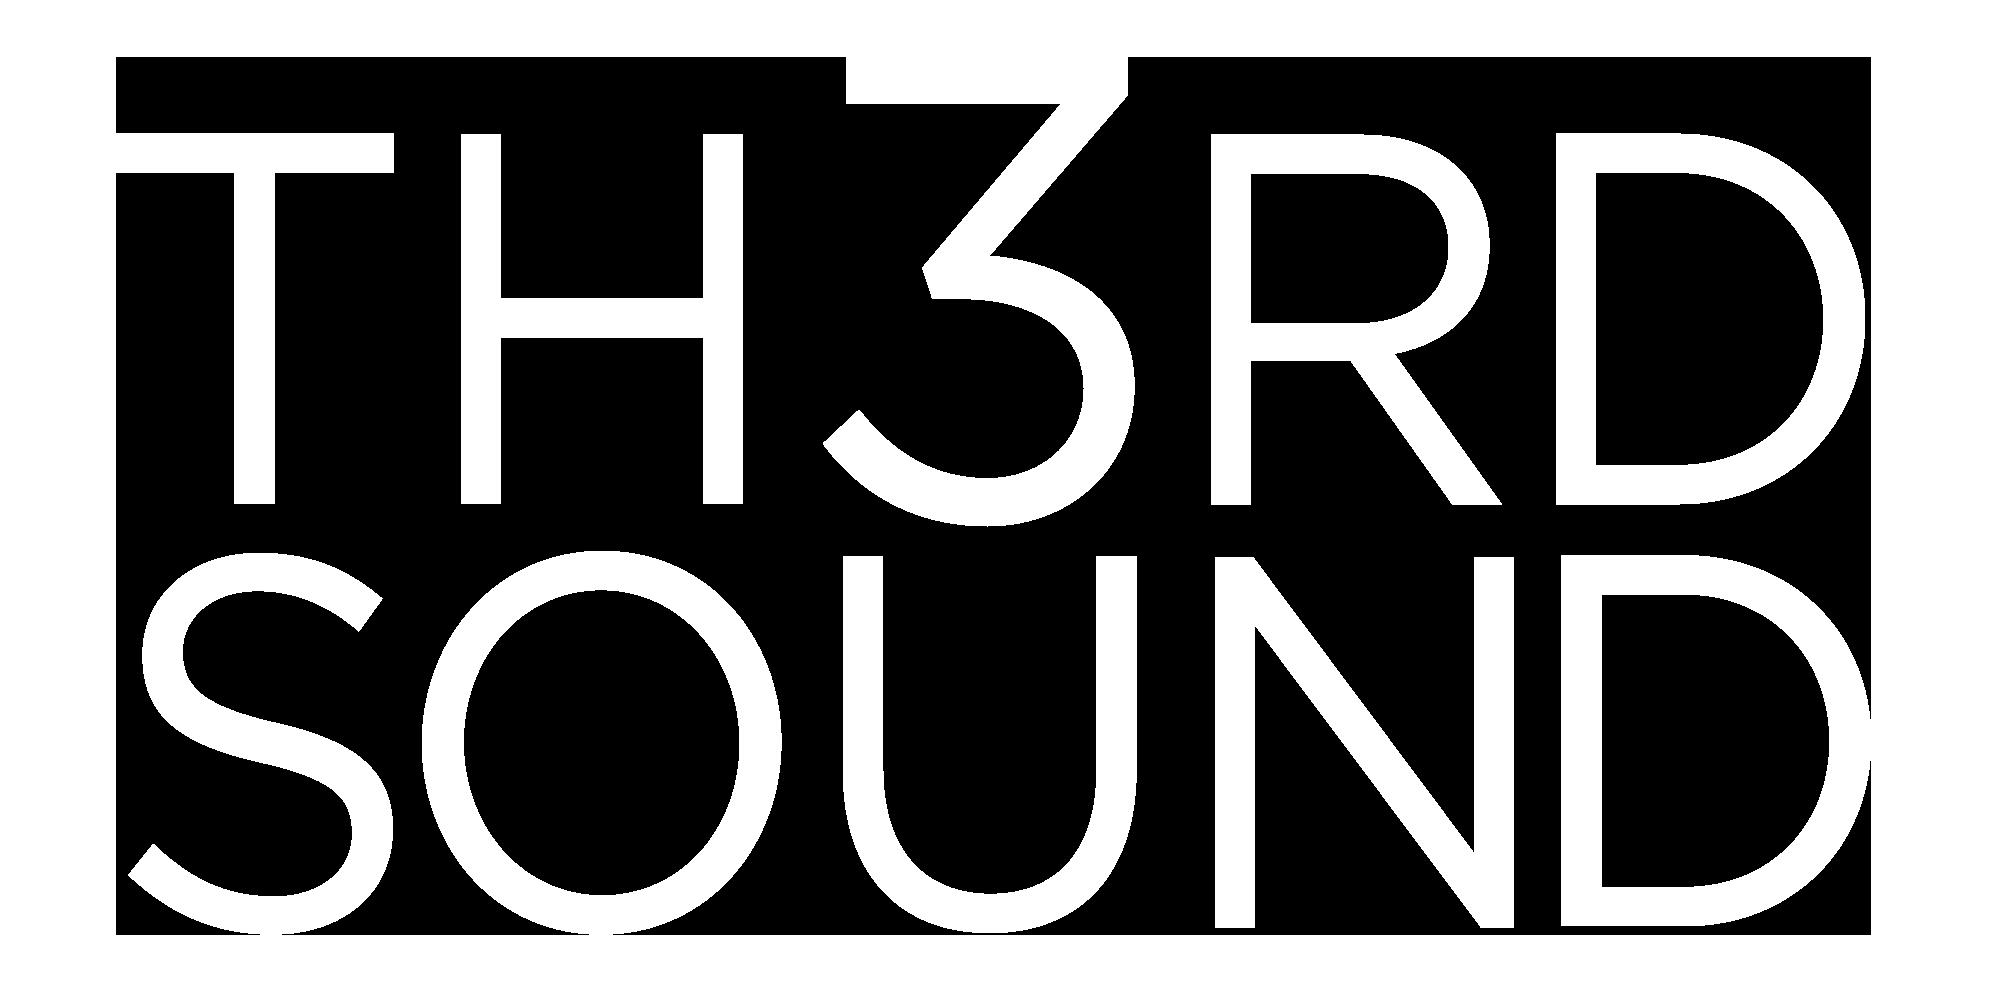 th3rd sound font logo